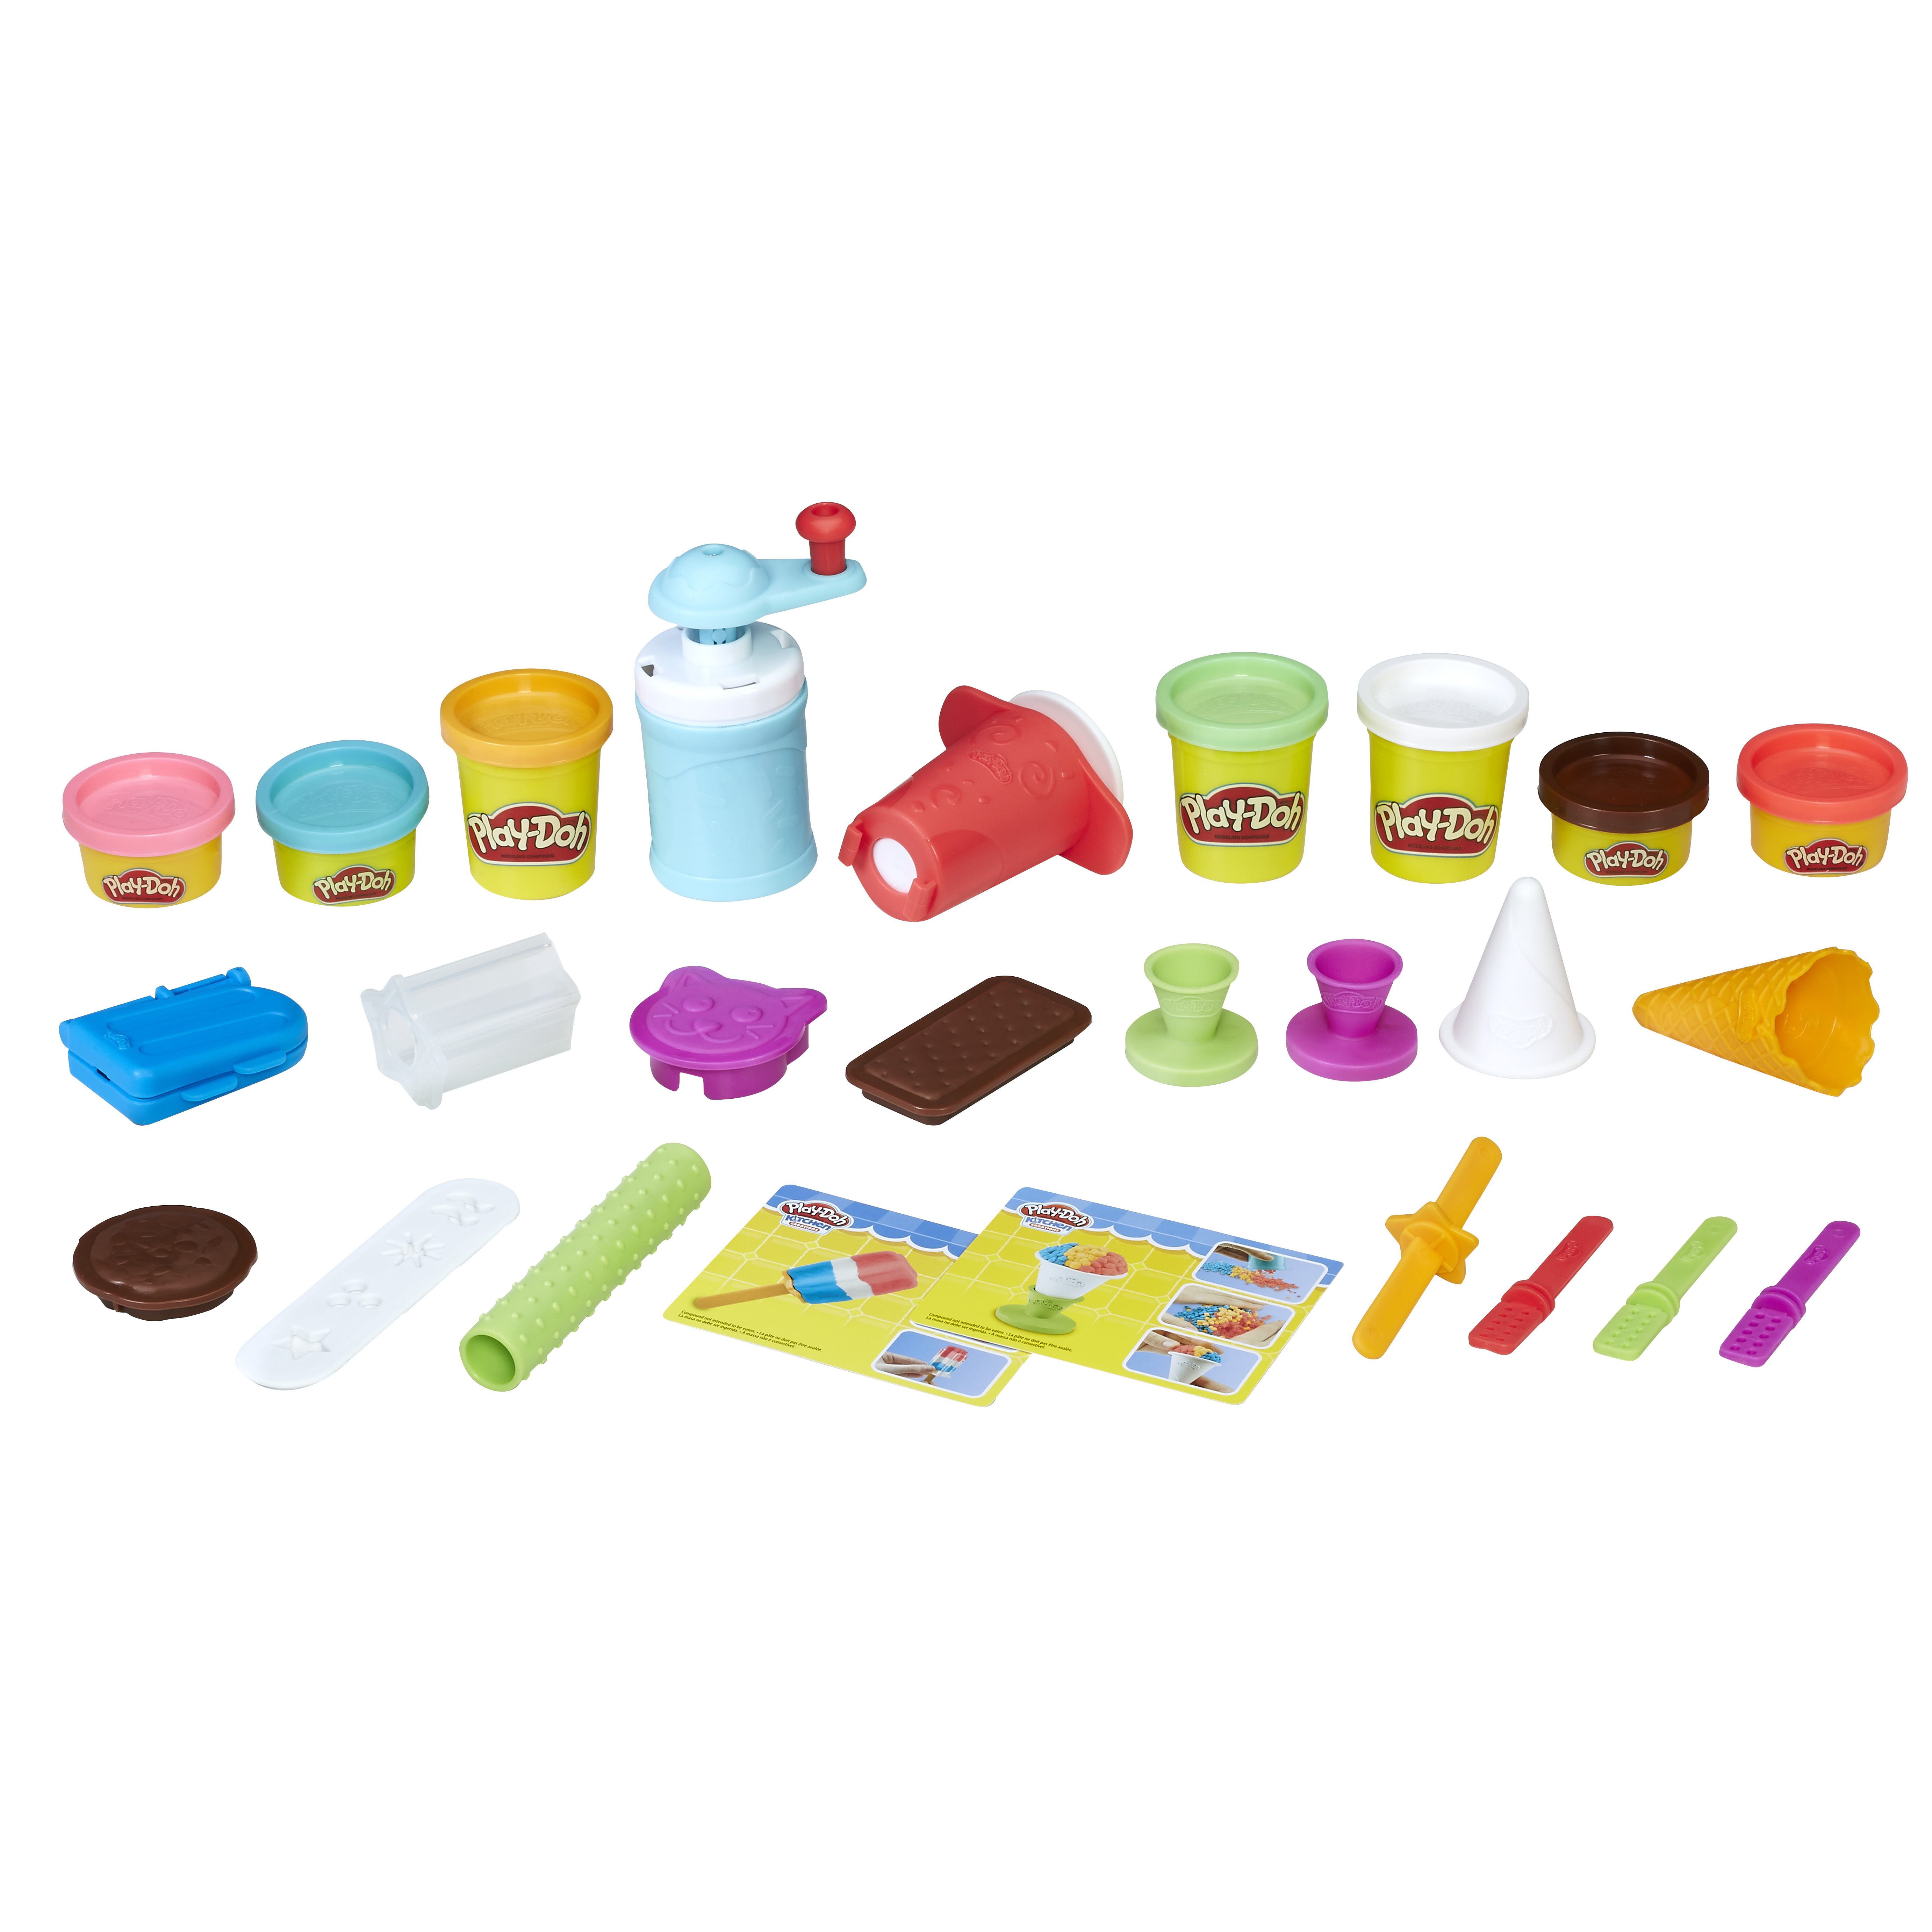 Play-Doh Play-Doh Создай любимое мороженое